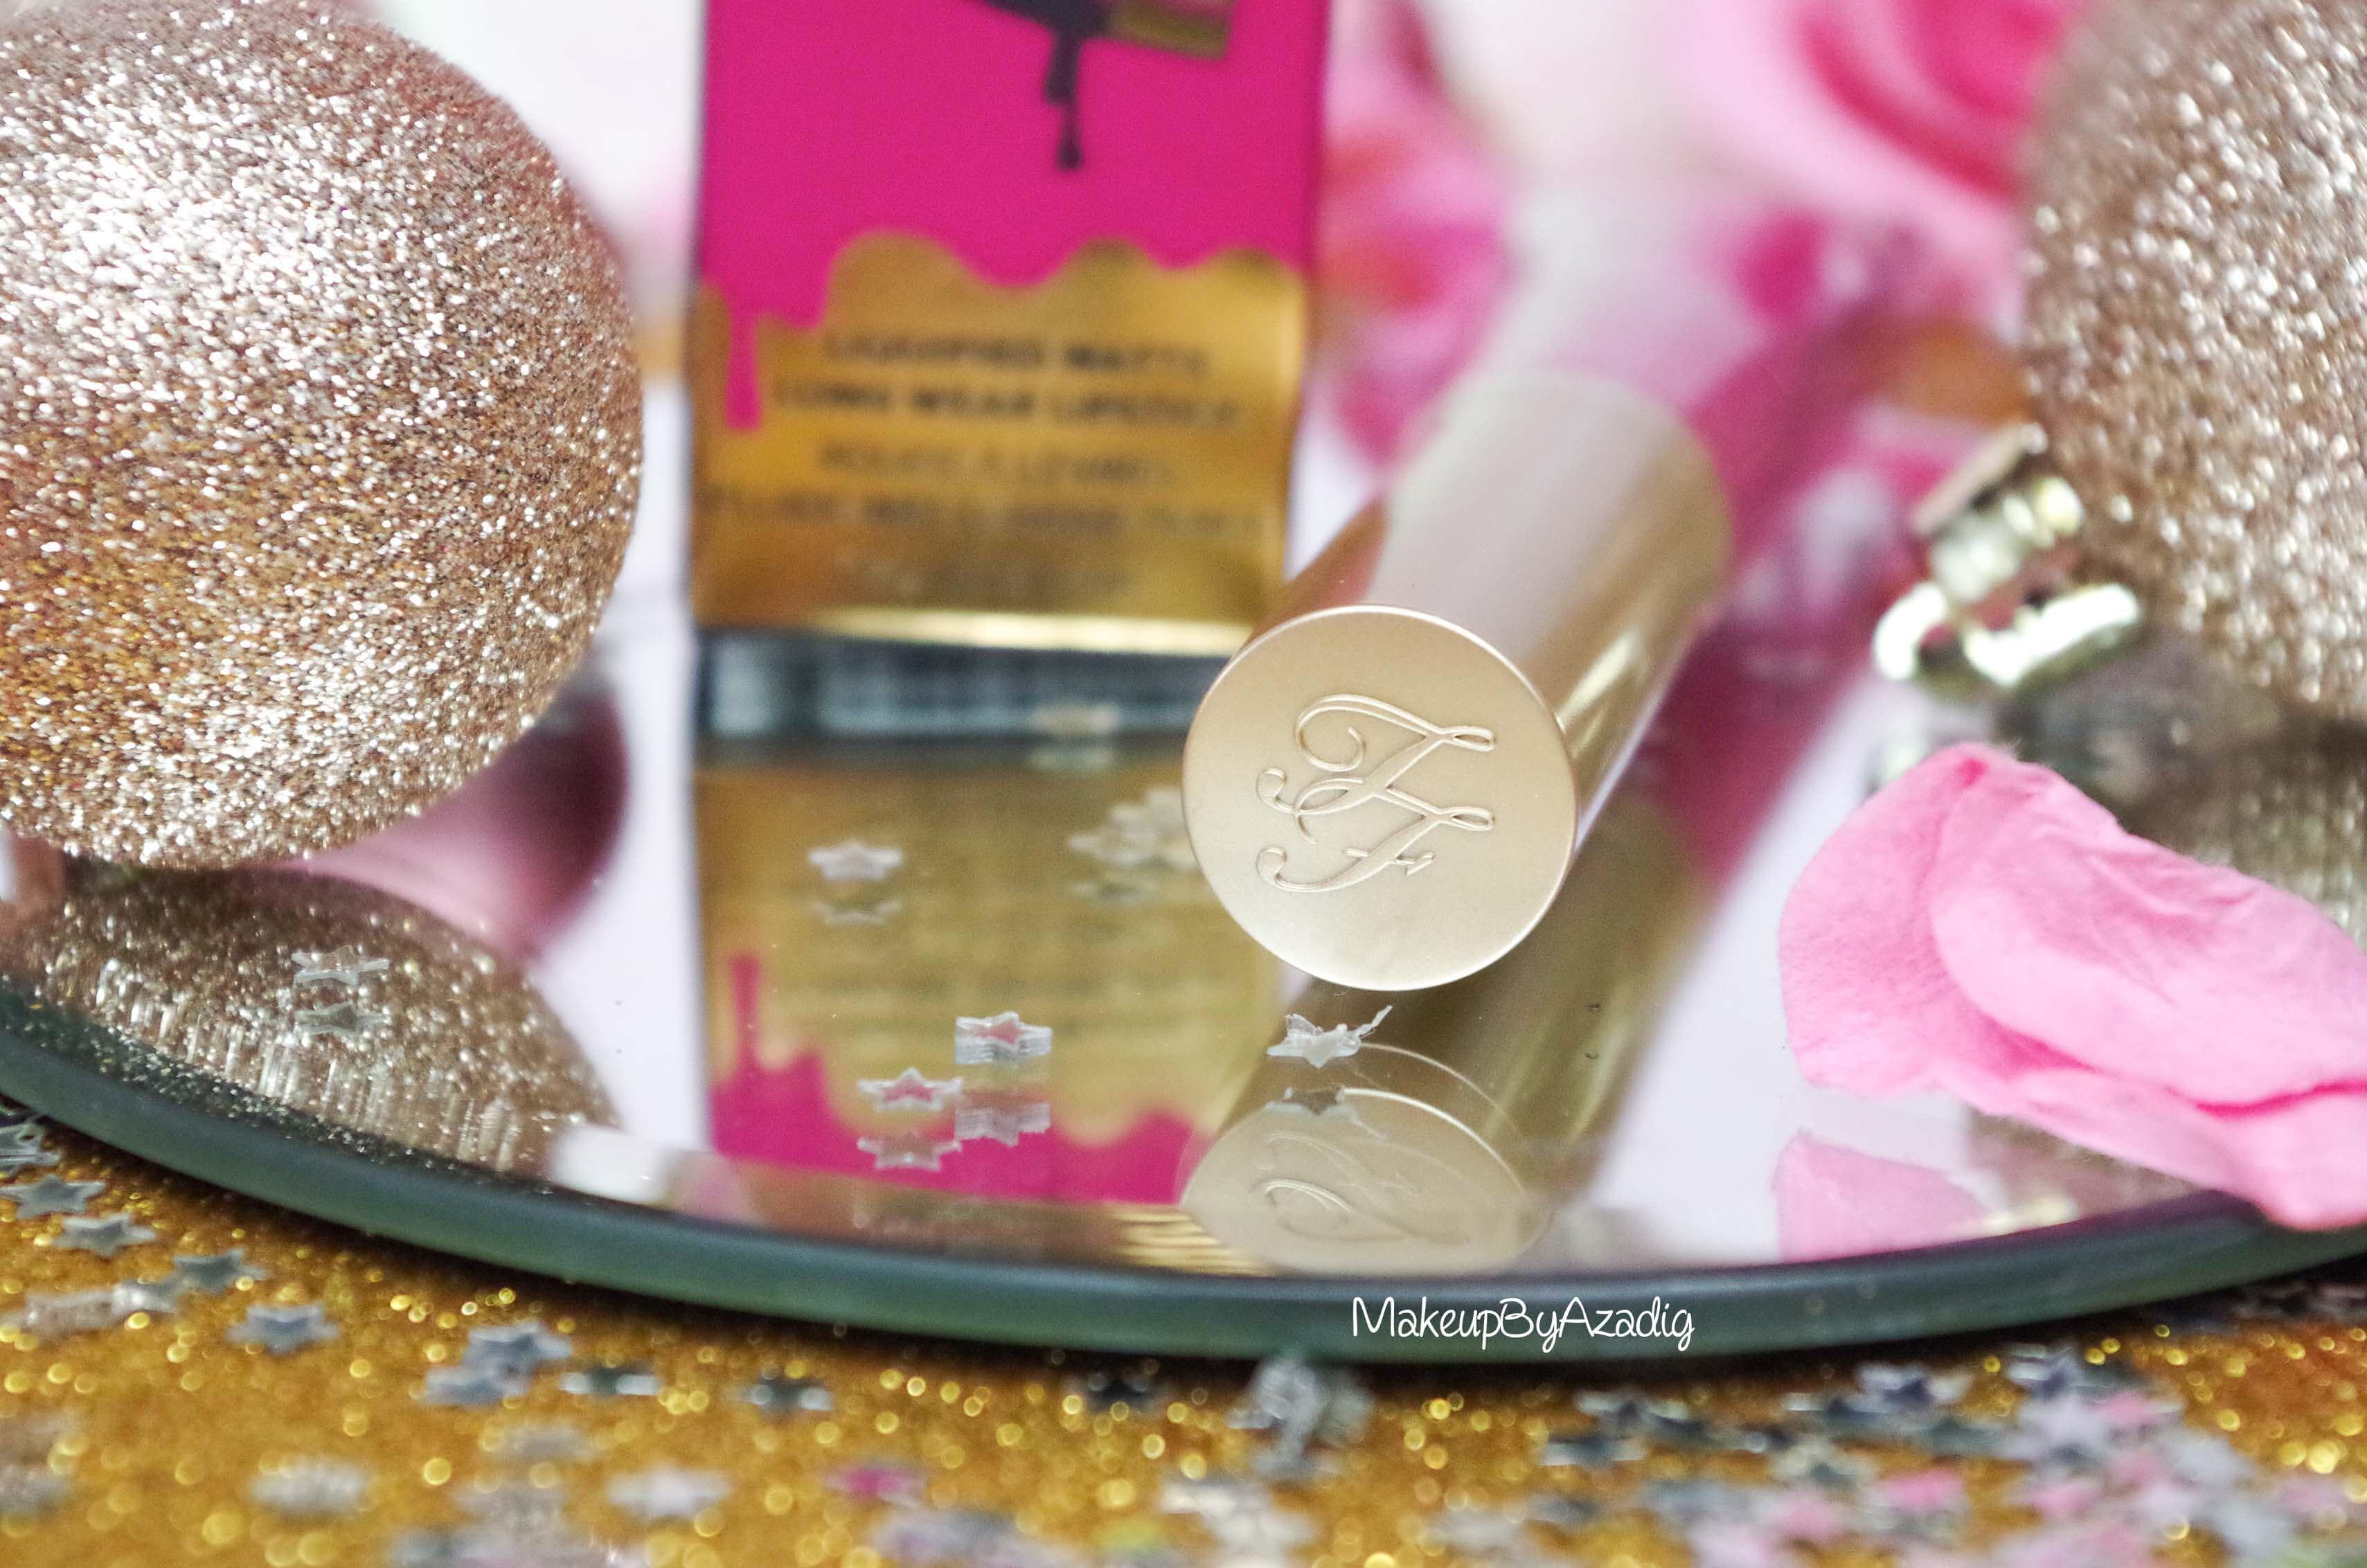 makeupbyazadig-melted-matte-queenb-bendandsnap-influencer-too-faced-rouge-levres-revue-avis-prix-sephora-paris-blog-liquide-TF